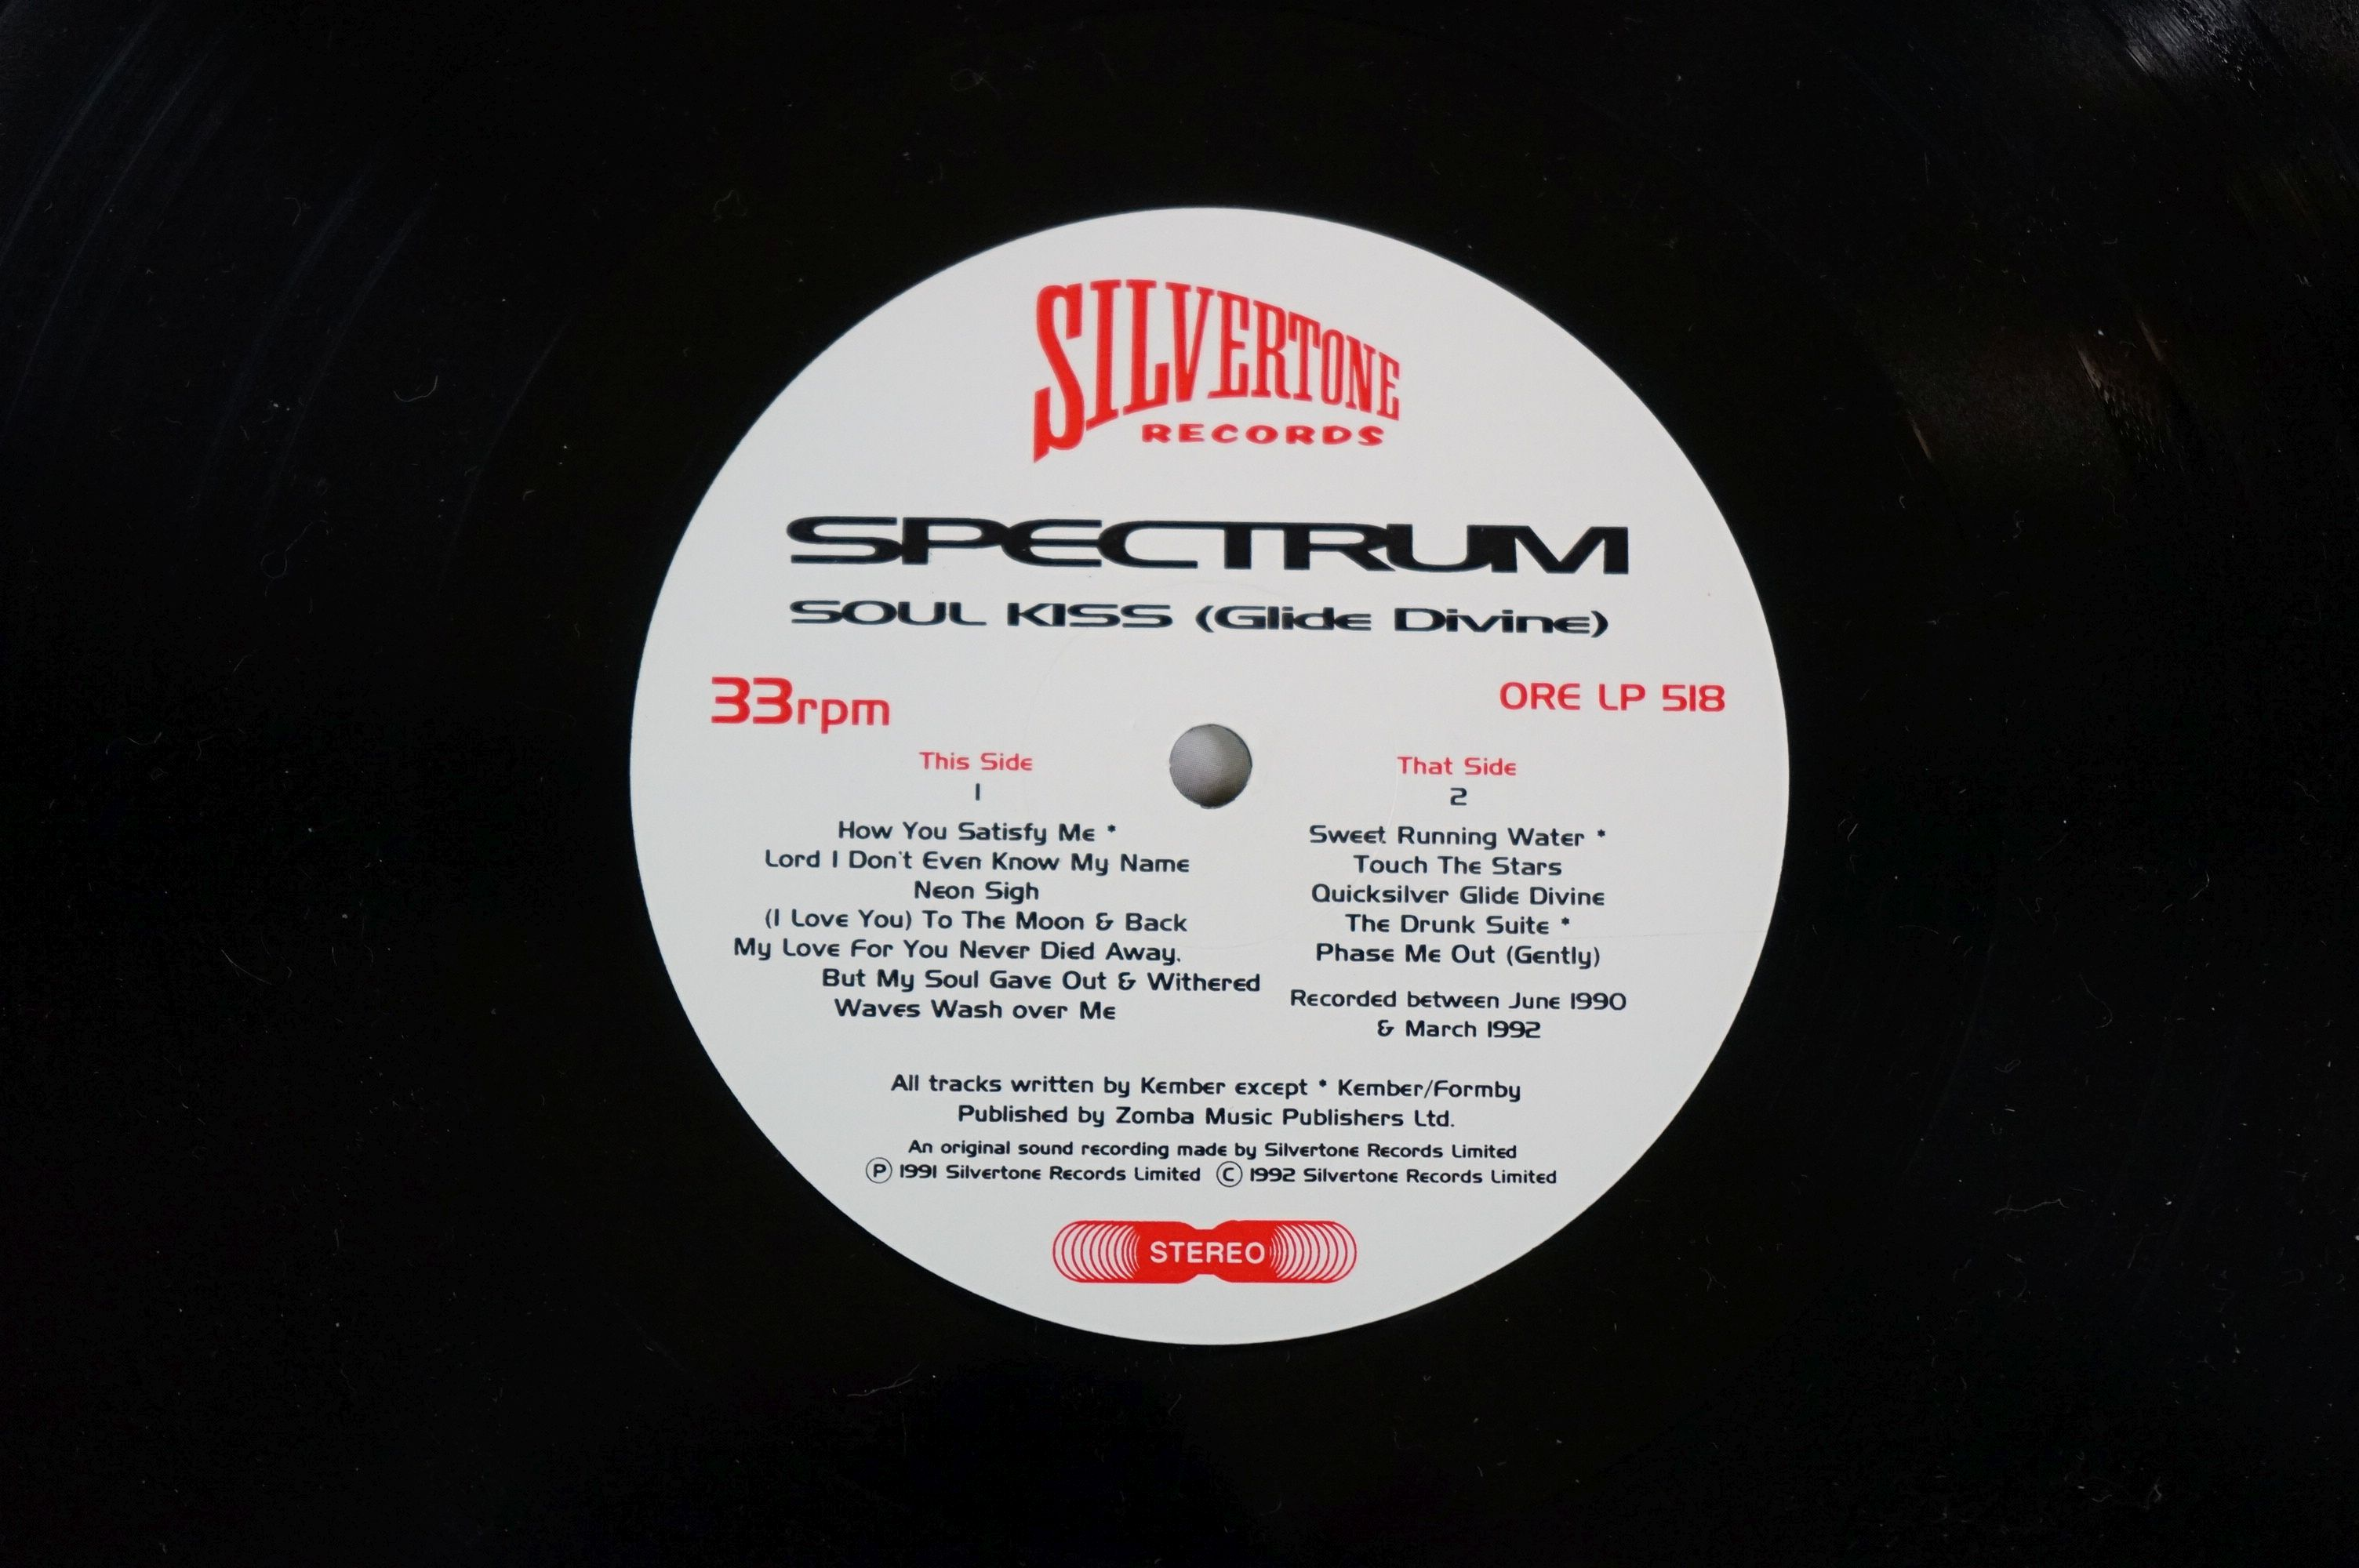 Vinyl - Spectrum Soul Kiss (Glide Devine) ORE LP 518 on Silvertone Records, original inner with - Image 6 of 6